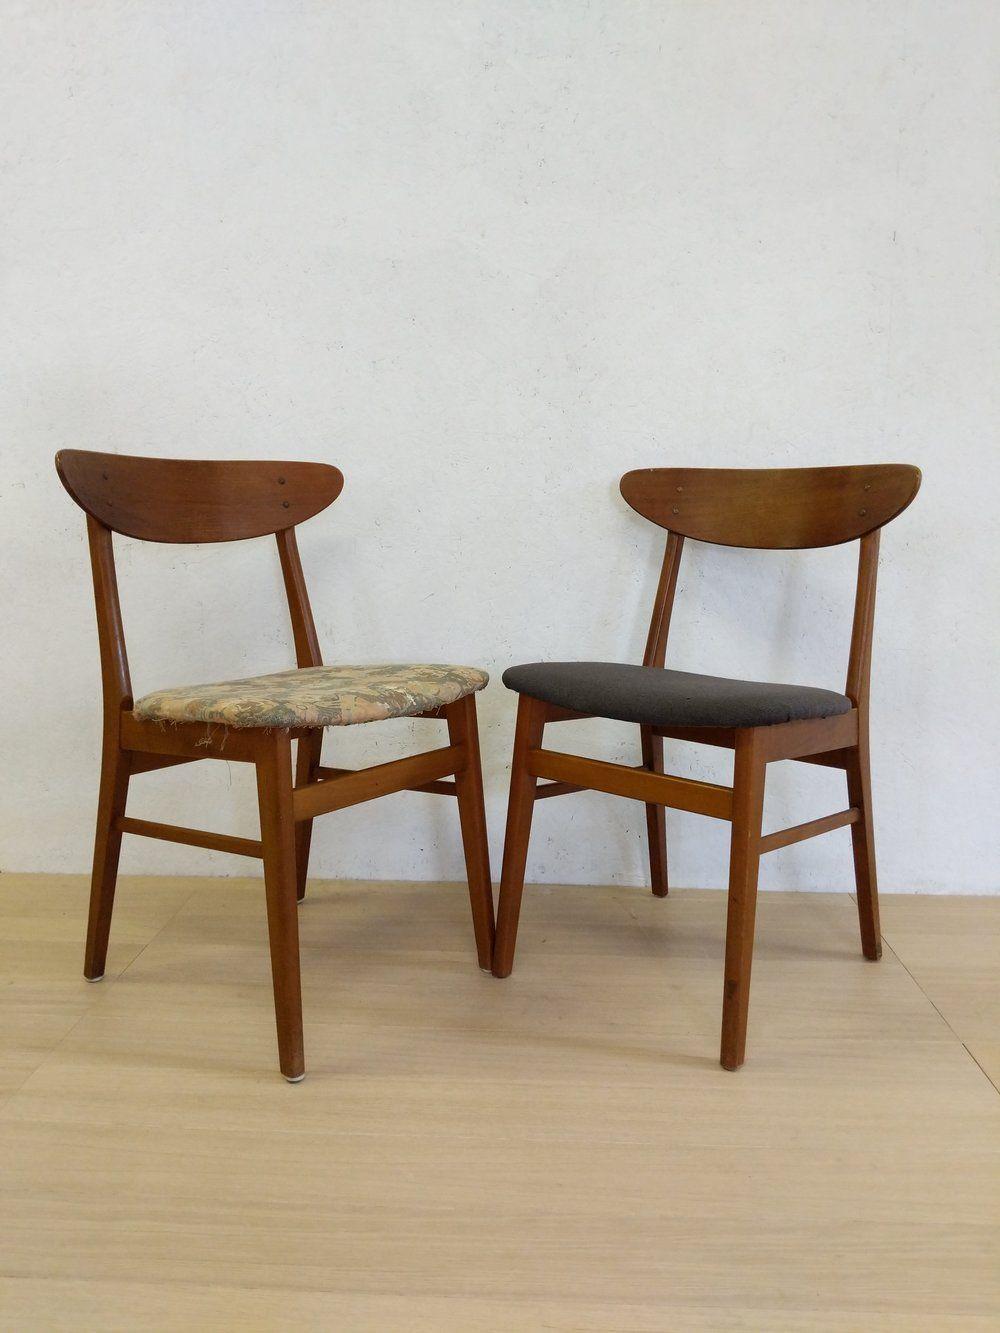 Sensational Pair Of Vintage Danish Modern Farstrup Dining Chairs Round Squirreltailoven Fun Painted Chair Ideas Images Squirreltailovenorg